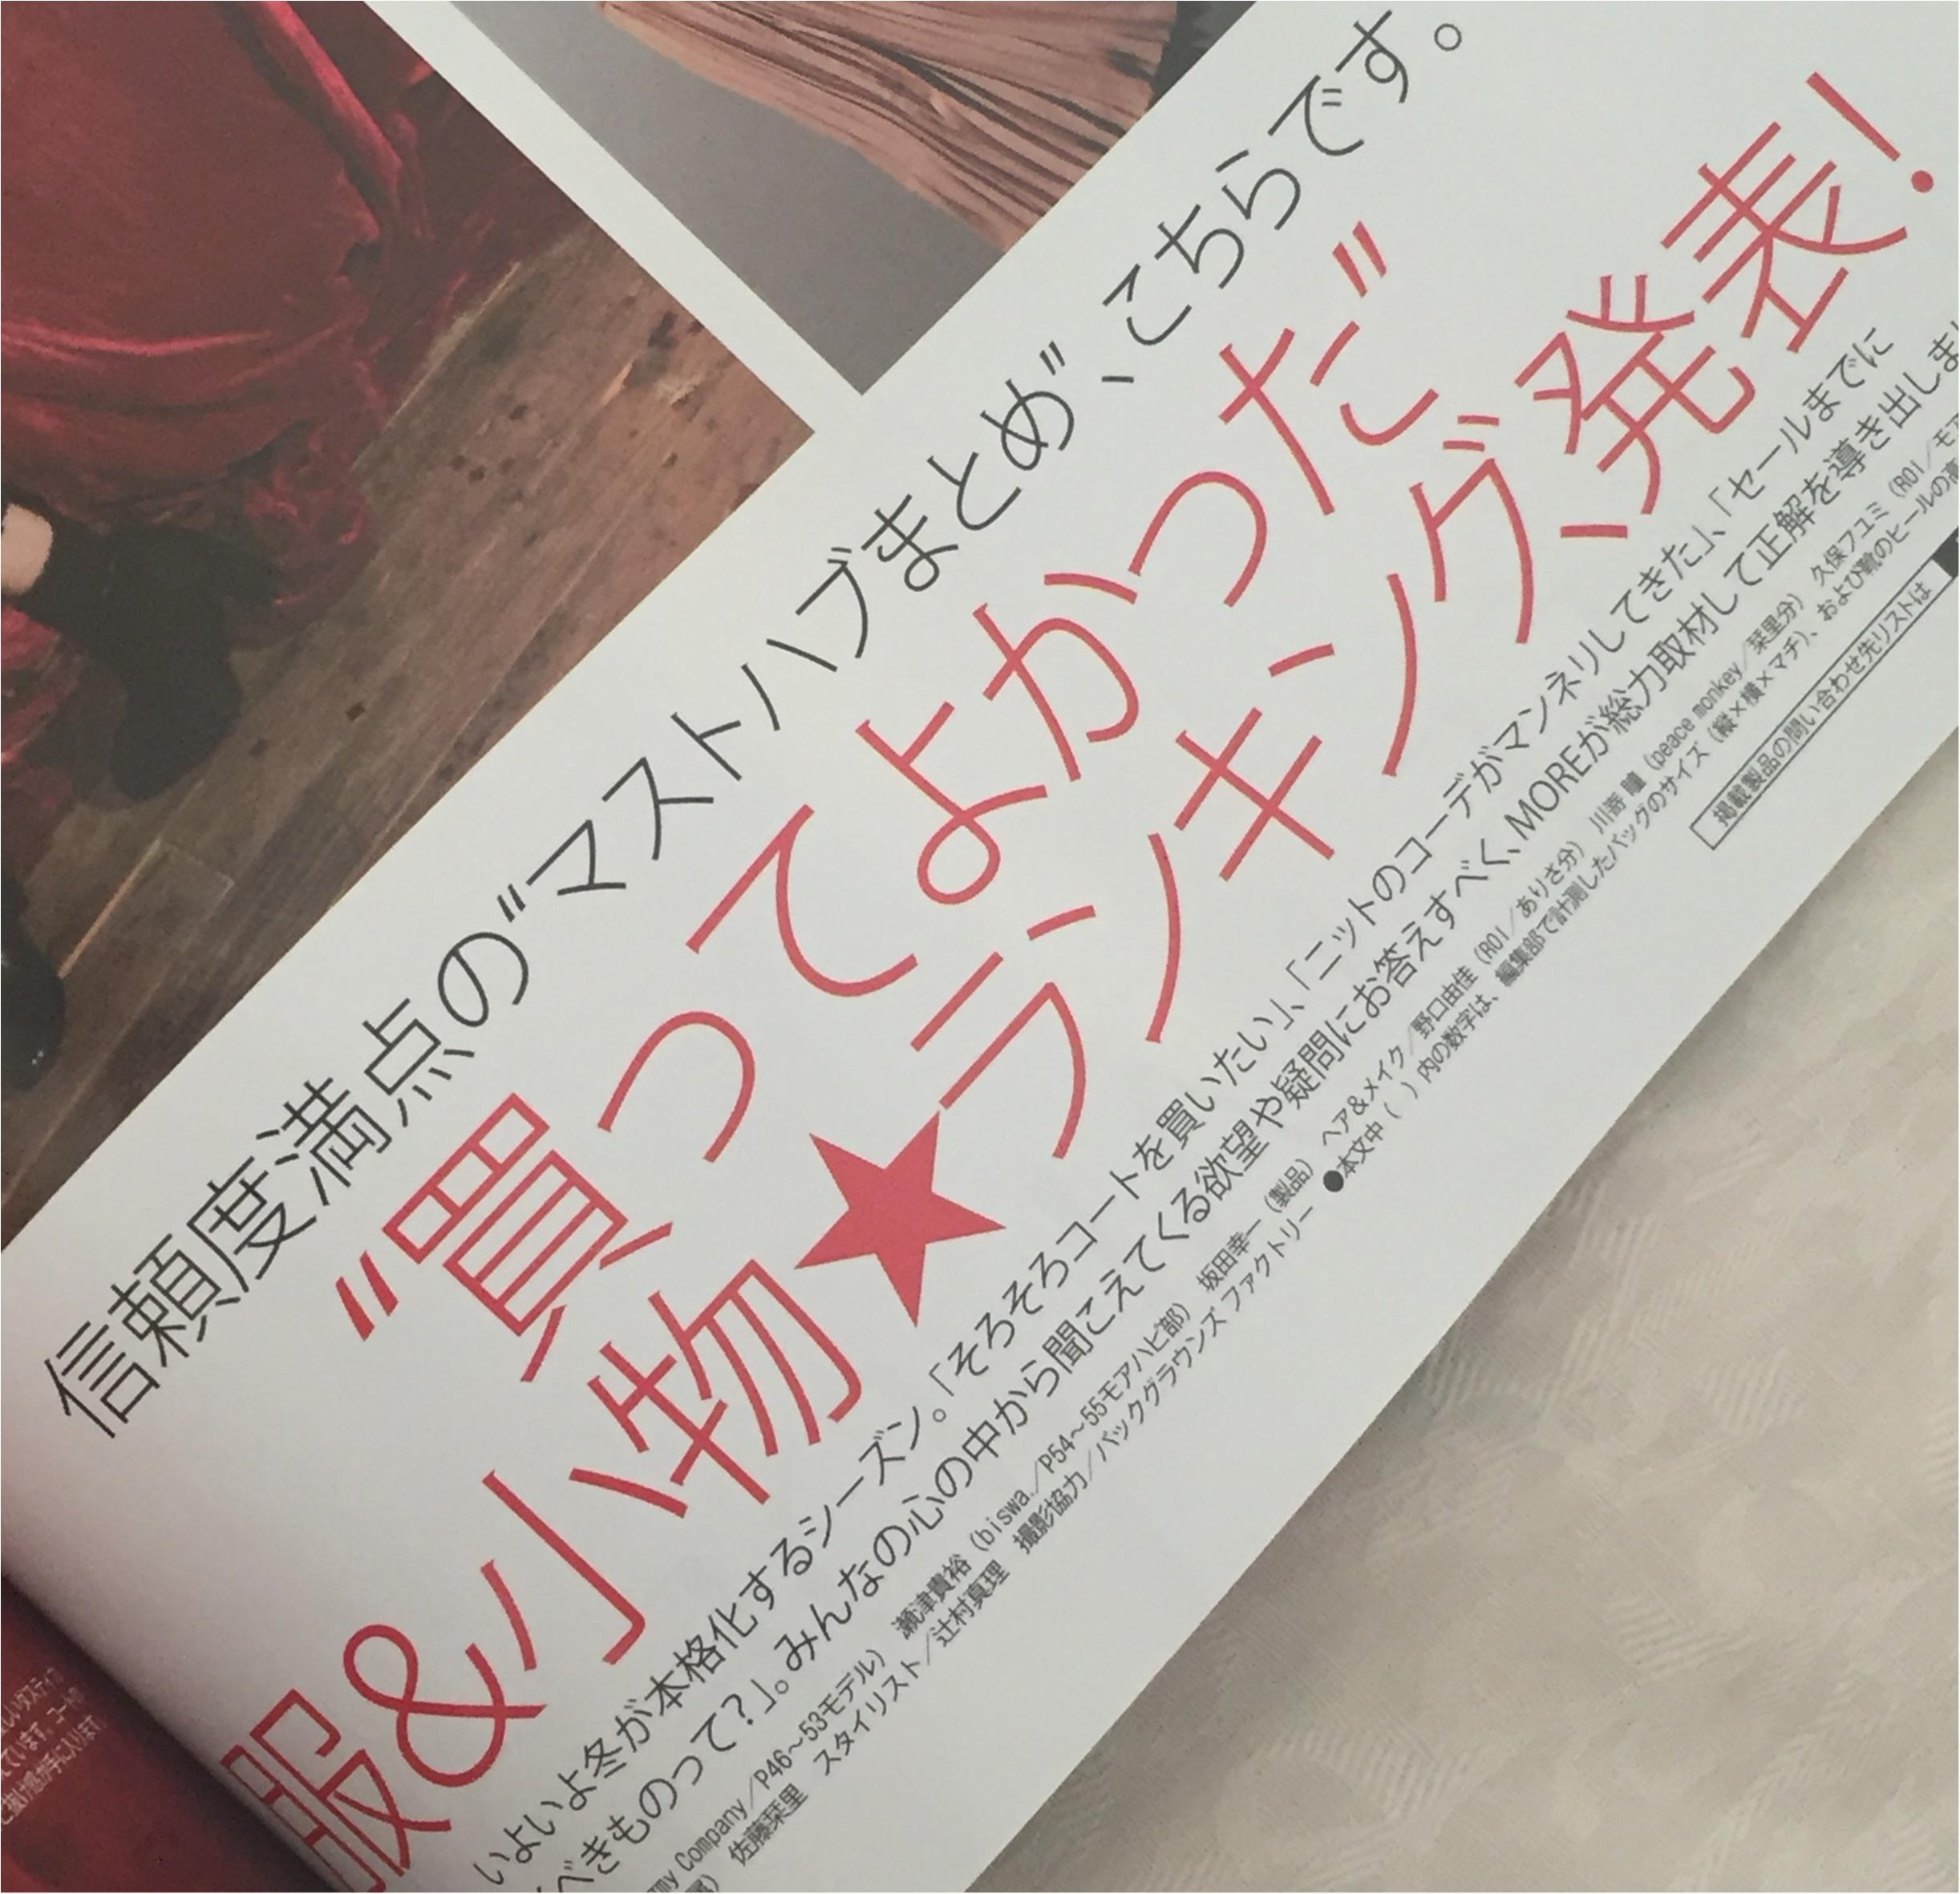 【MORE12月号☆発売中】特別付録はCOACHステーショナリー4点セット✨≪samenyan≫_6